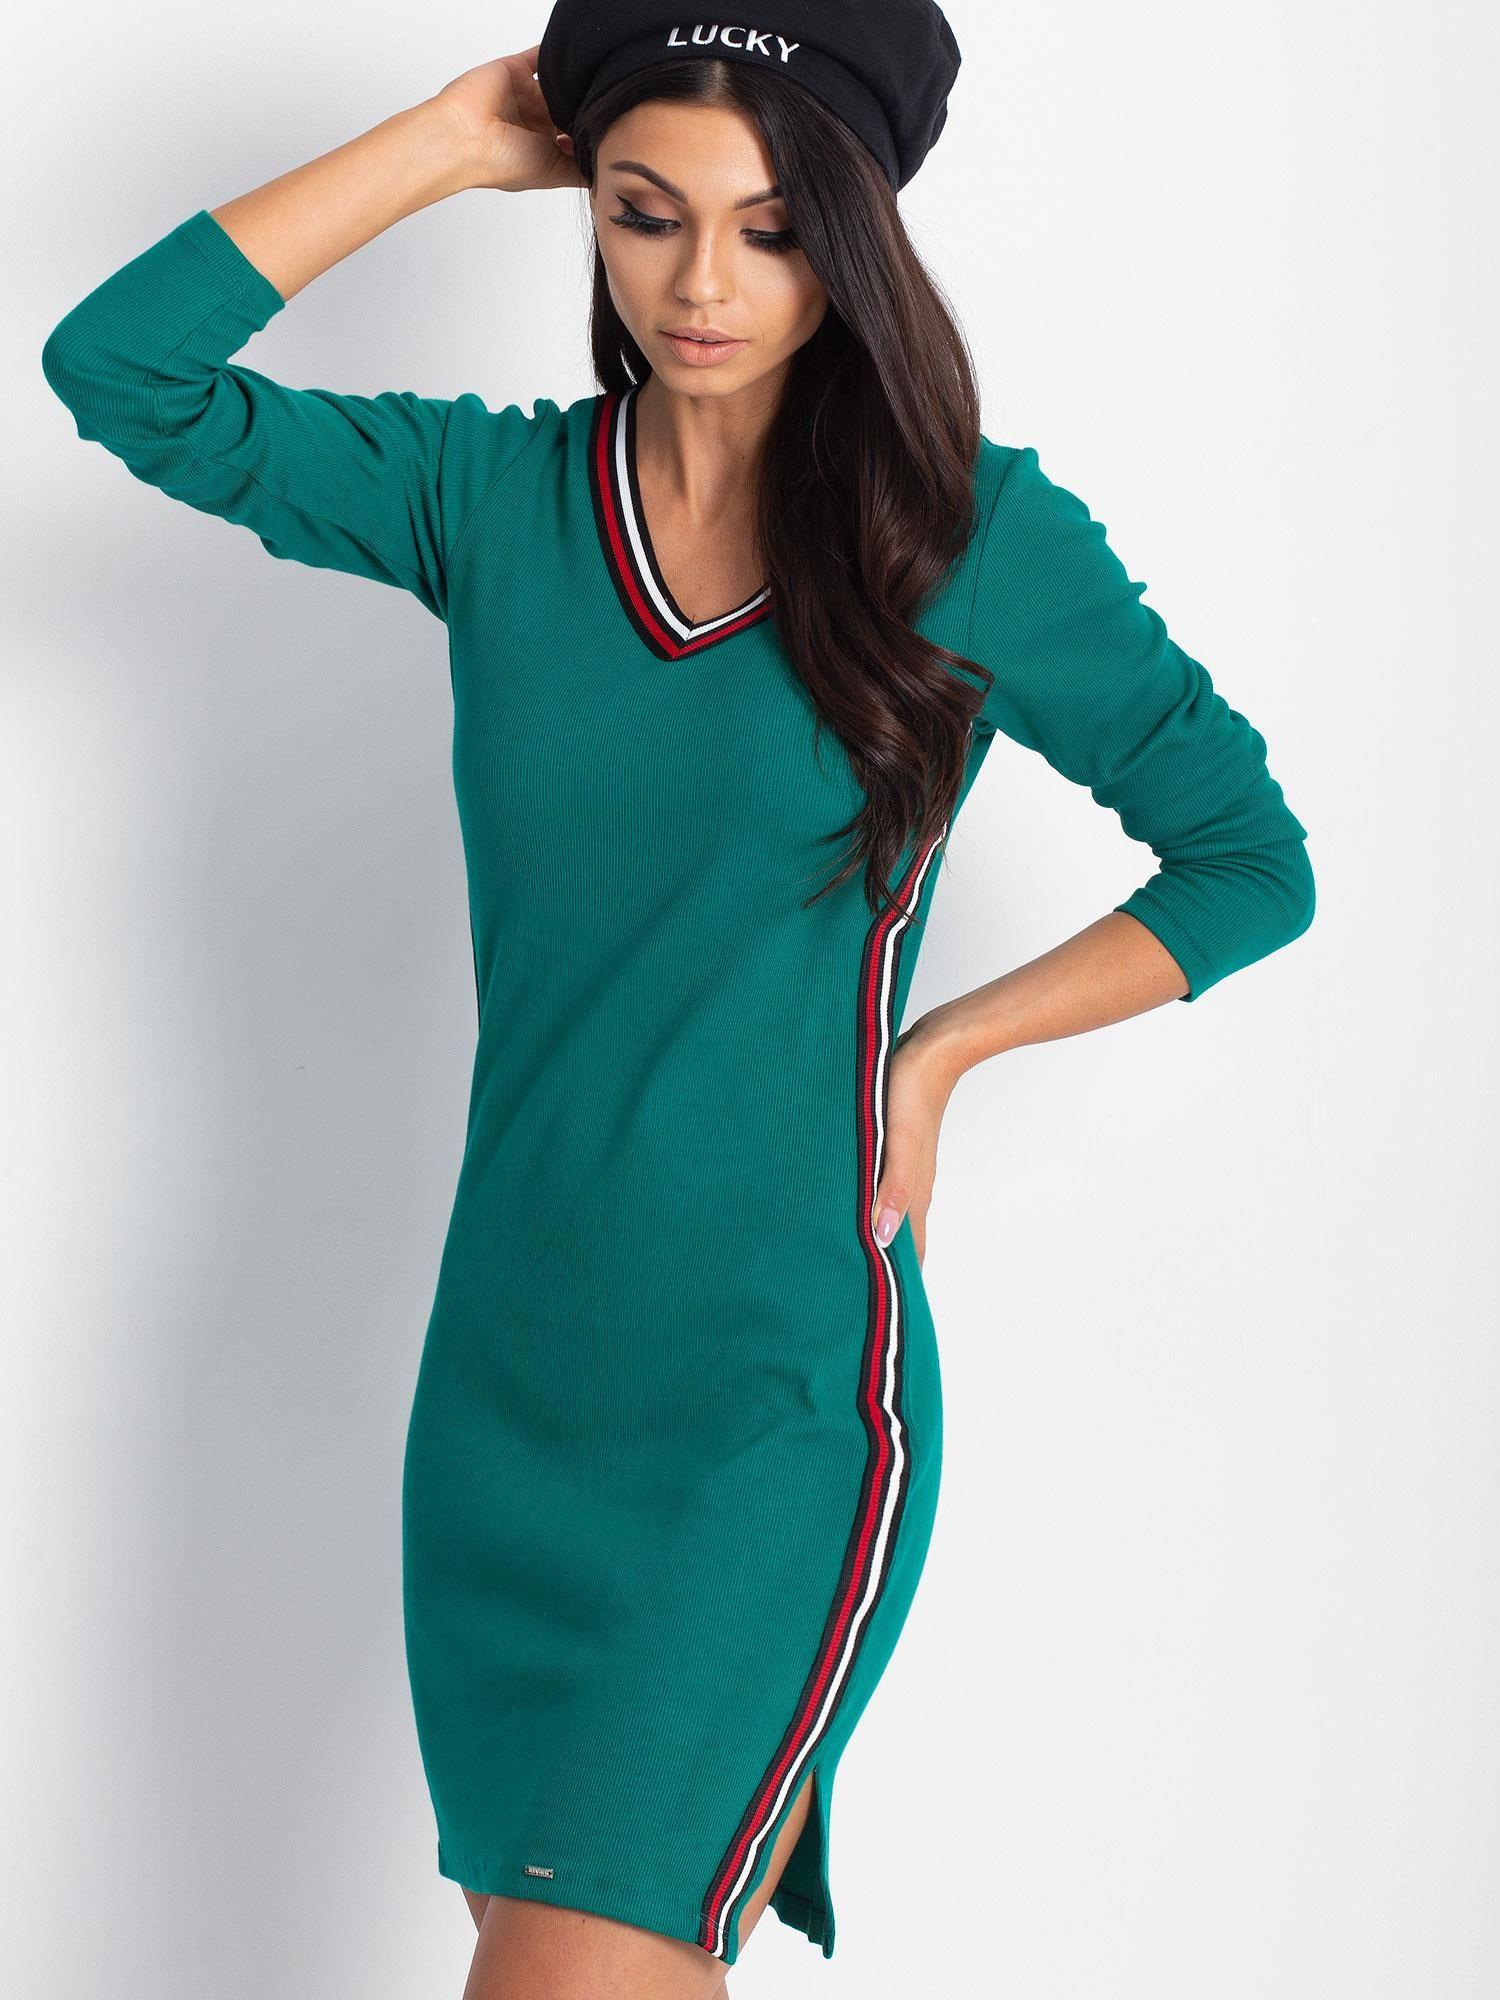 794b25b607 Granatowa dopasowana sukienka z lampasami - Sukienka dopasowana - sklep  eButik.pl